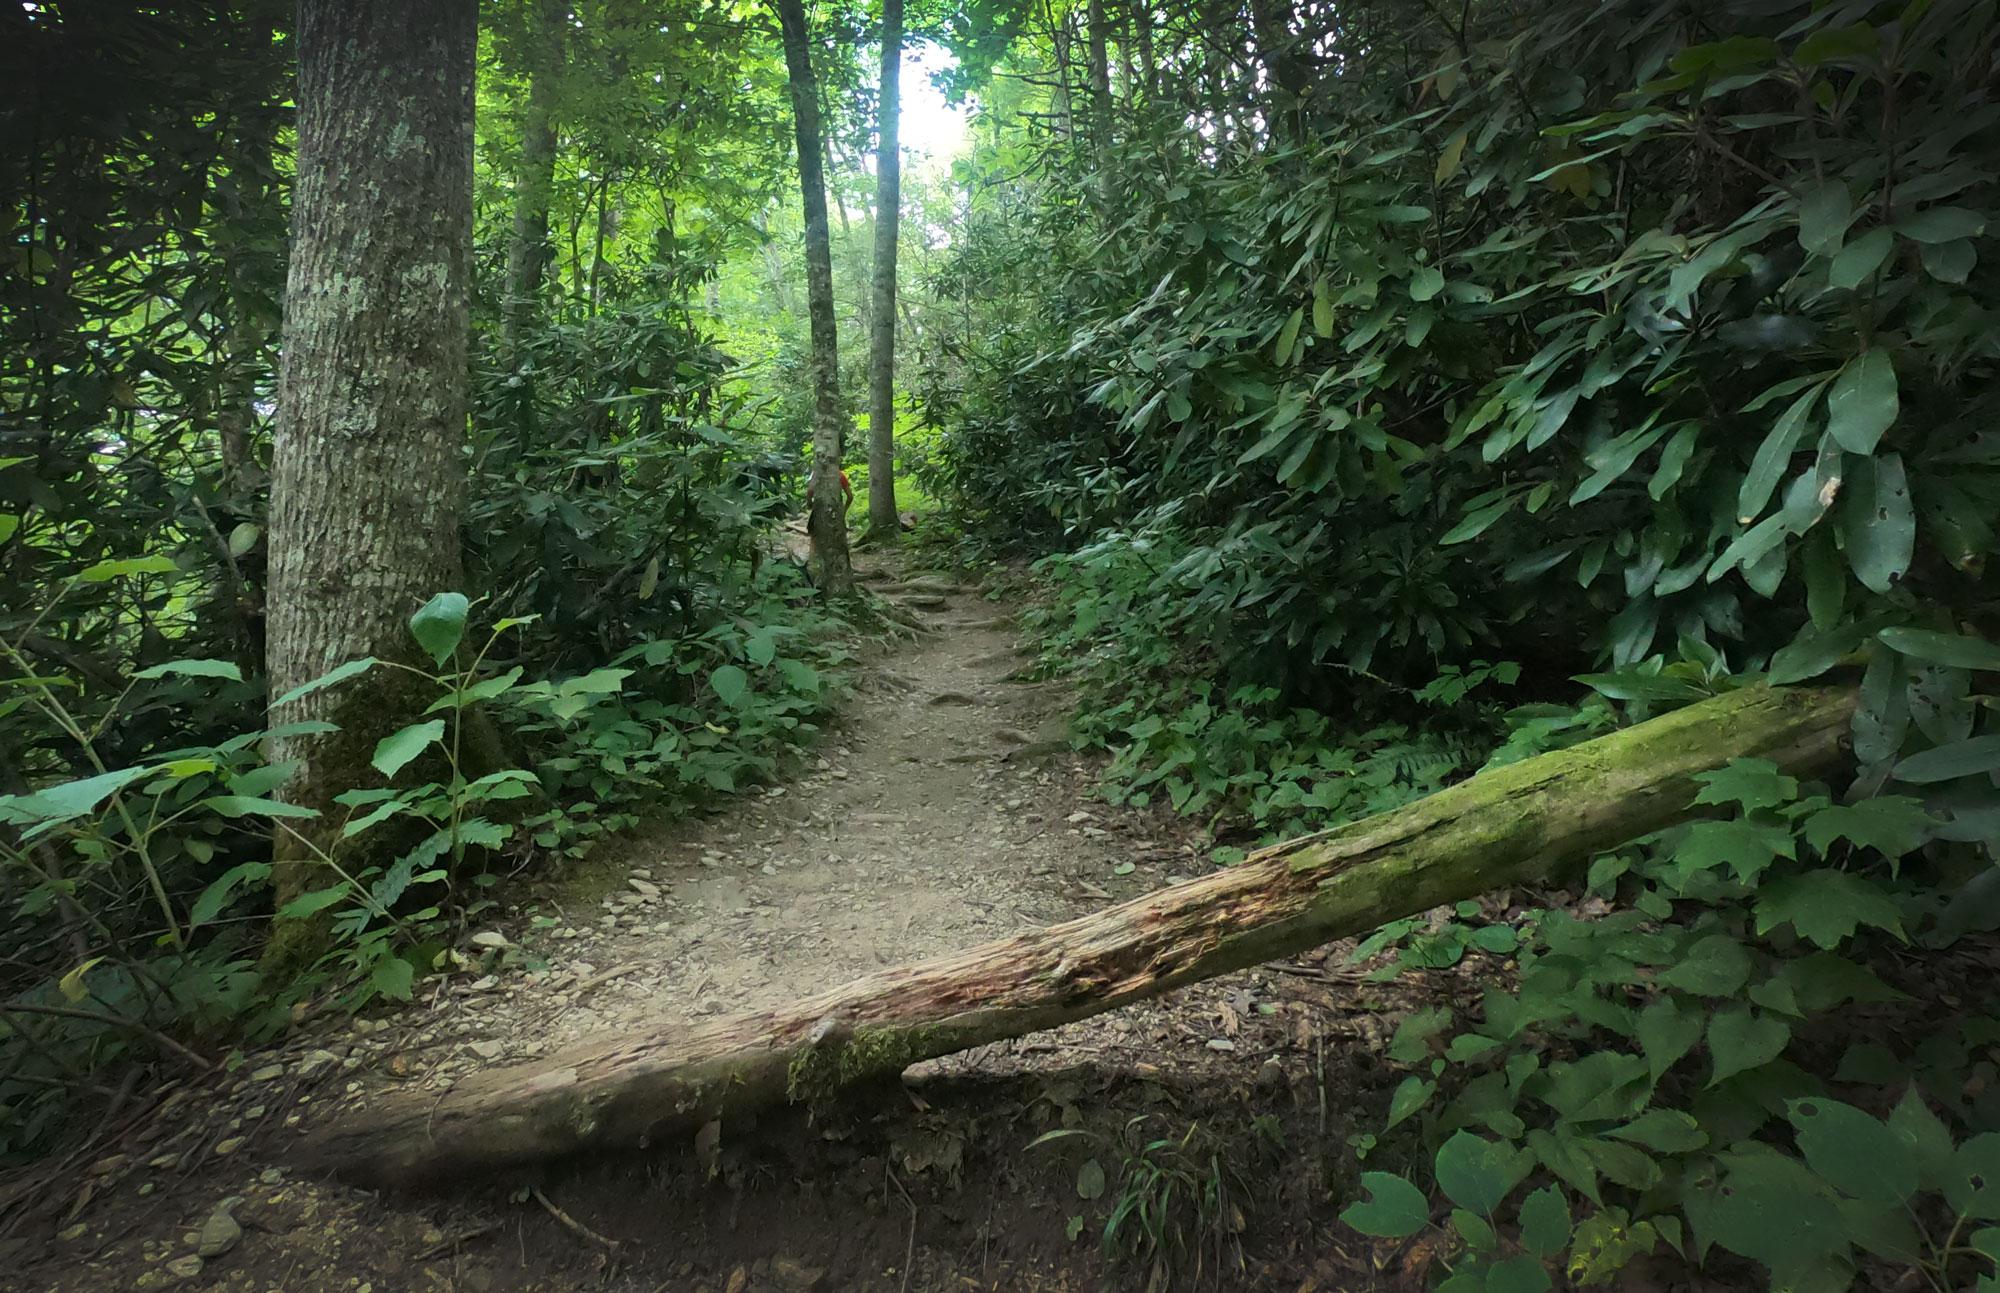 Hiking on the steep trail to Crab Orchard Falls, near Blue Ridge Parkway, North Carolina